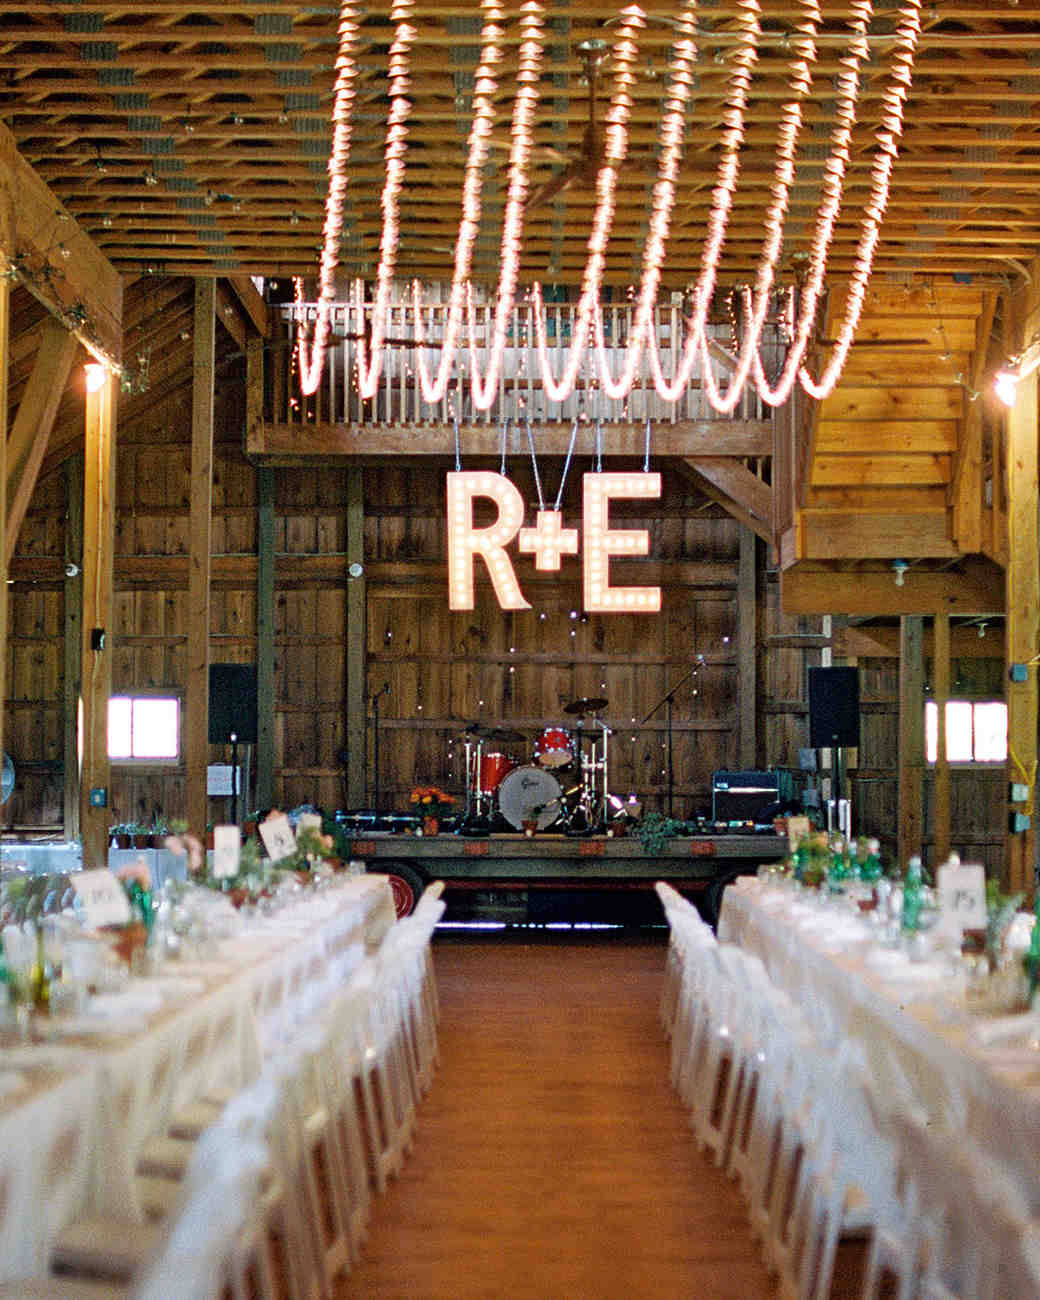 rachel elijah wedding barn bandstand and initials